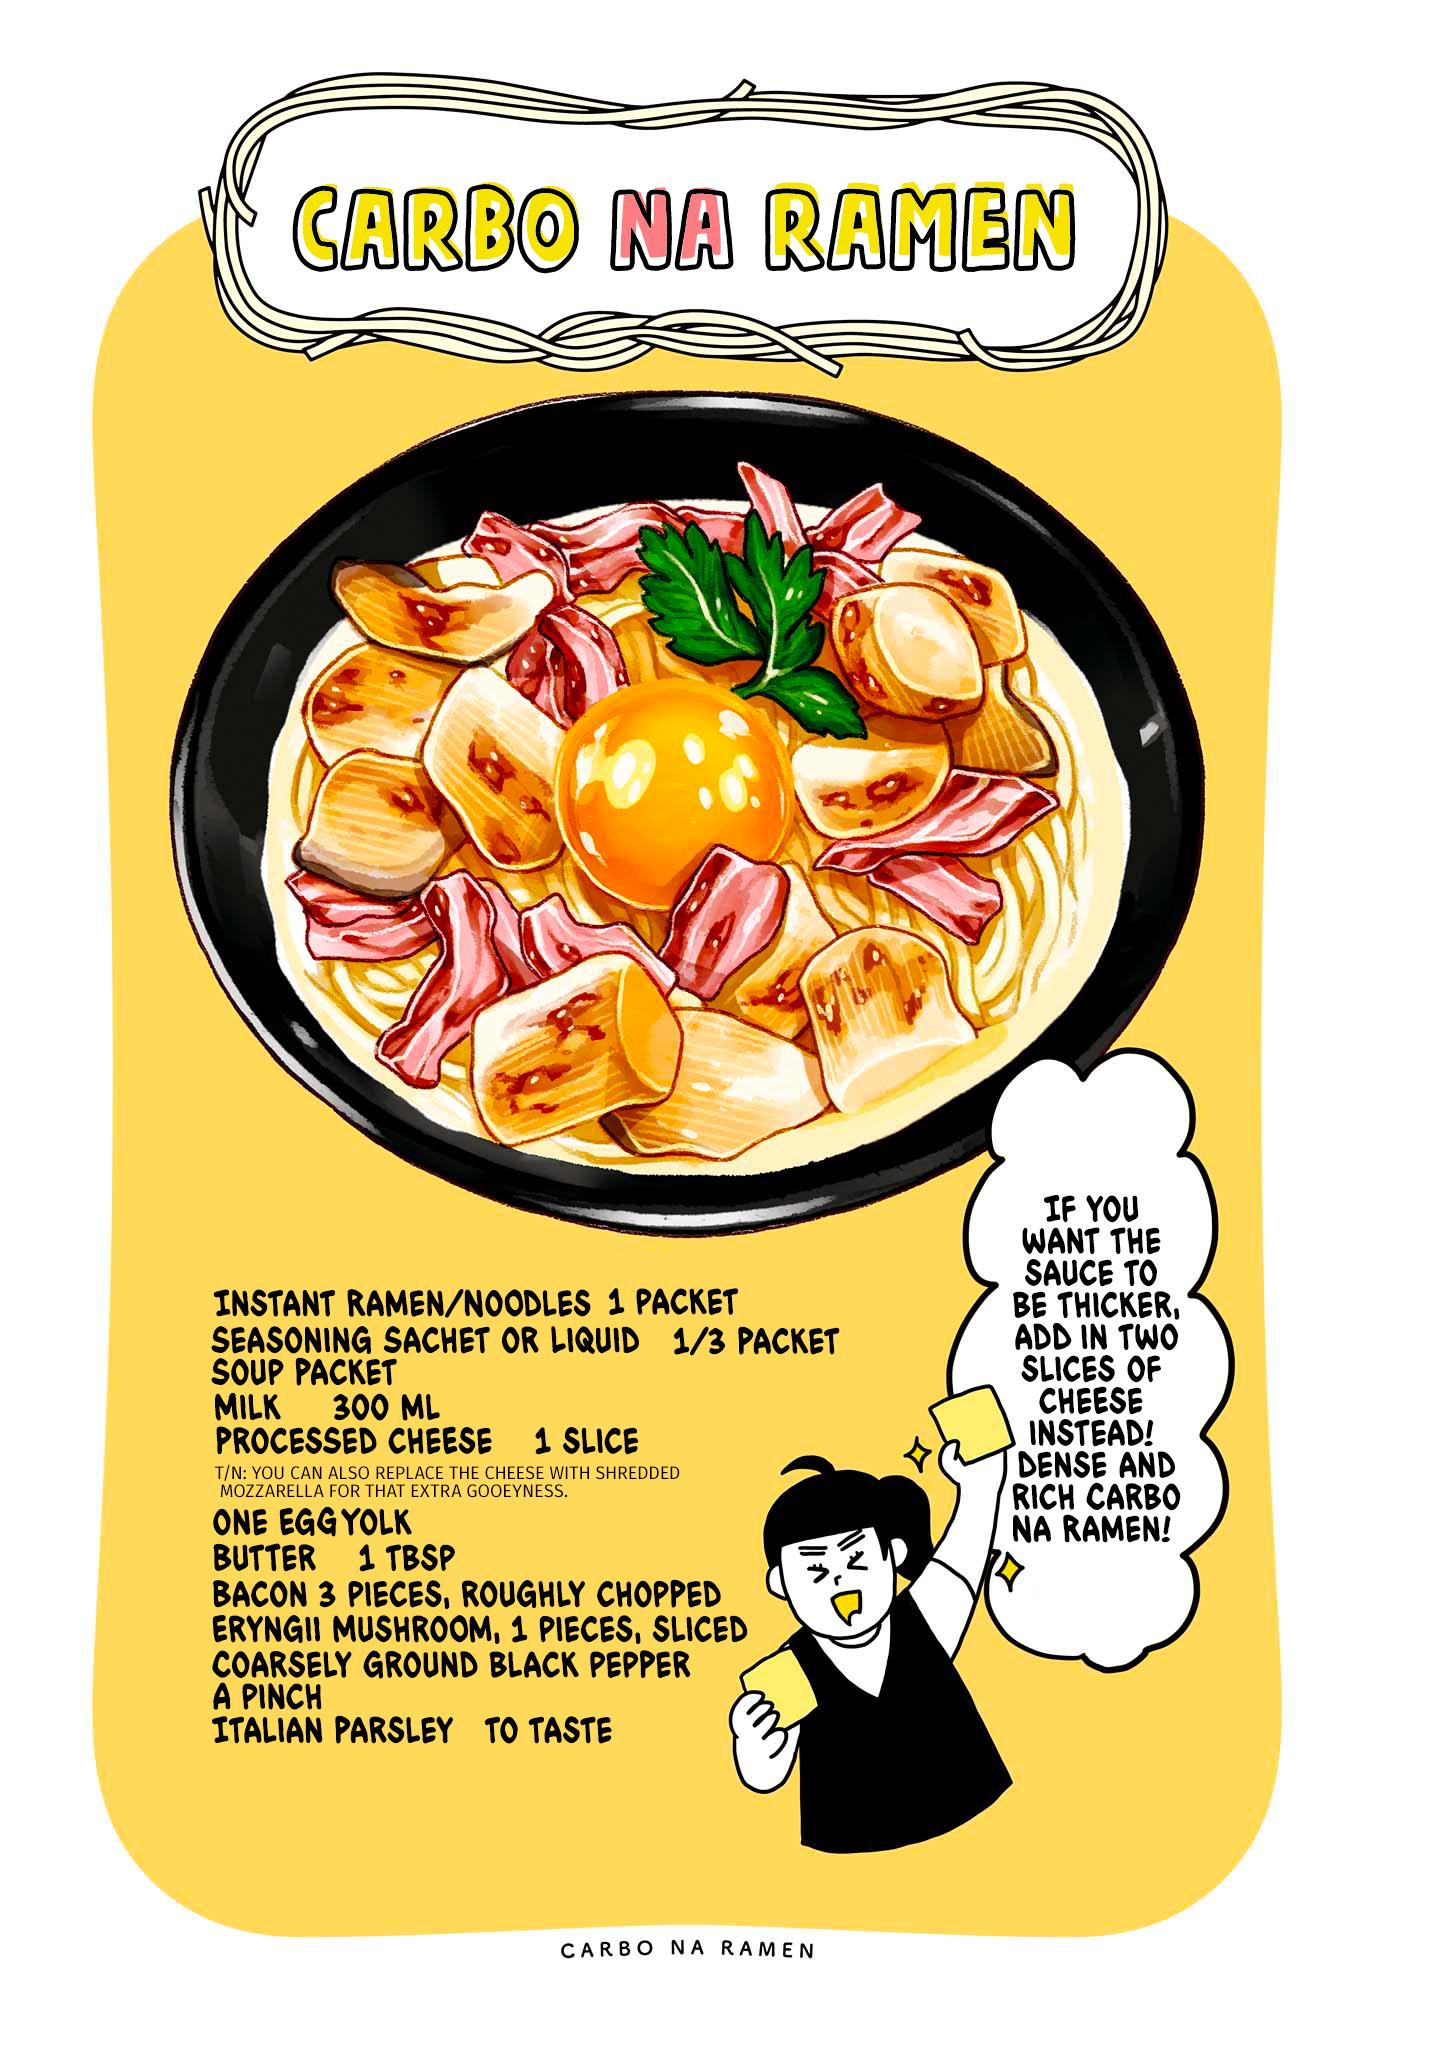 Anime food and cartoons food and food illustrations image